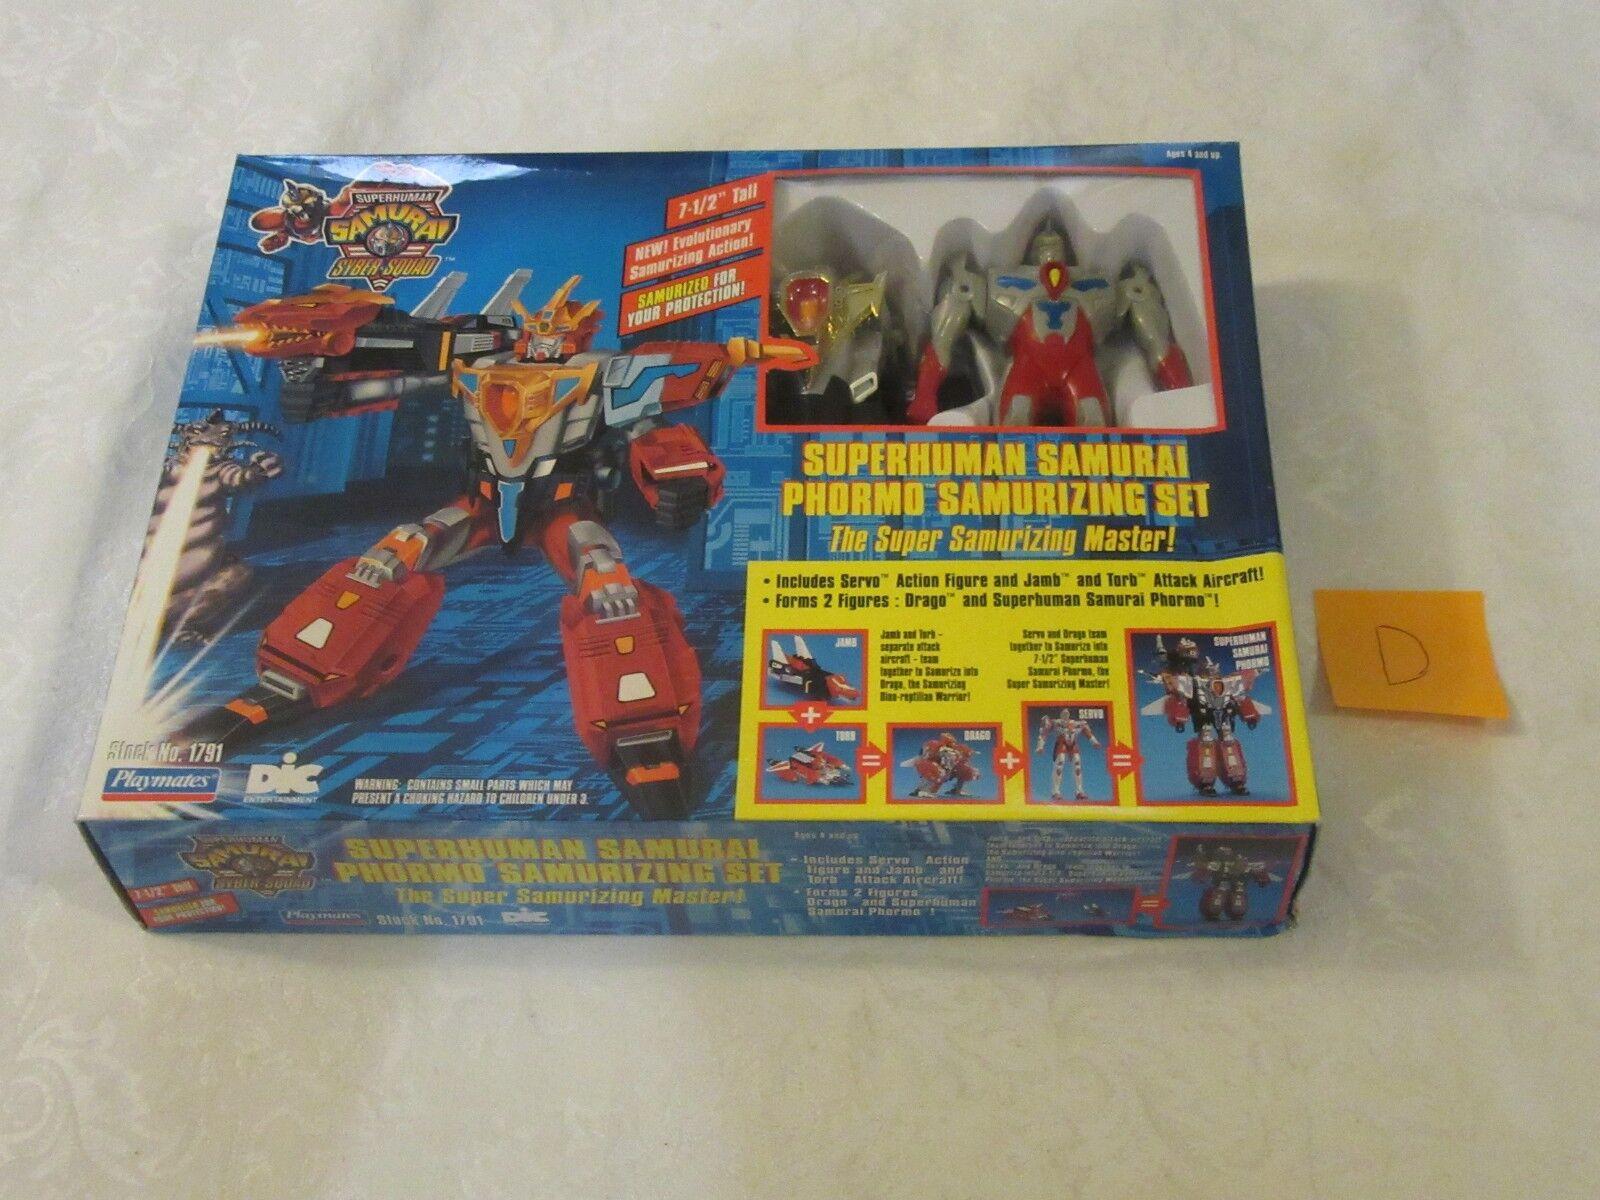 Playmates DIC SuperHuman SuperHuman SuperHuman Samurai Syber-Squad Phormo Samurizing Set 1994 D e20757